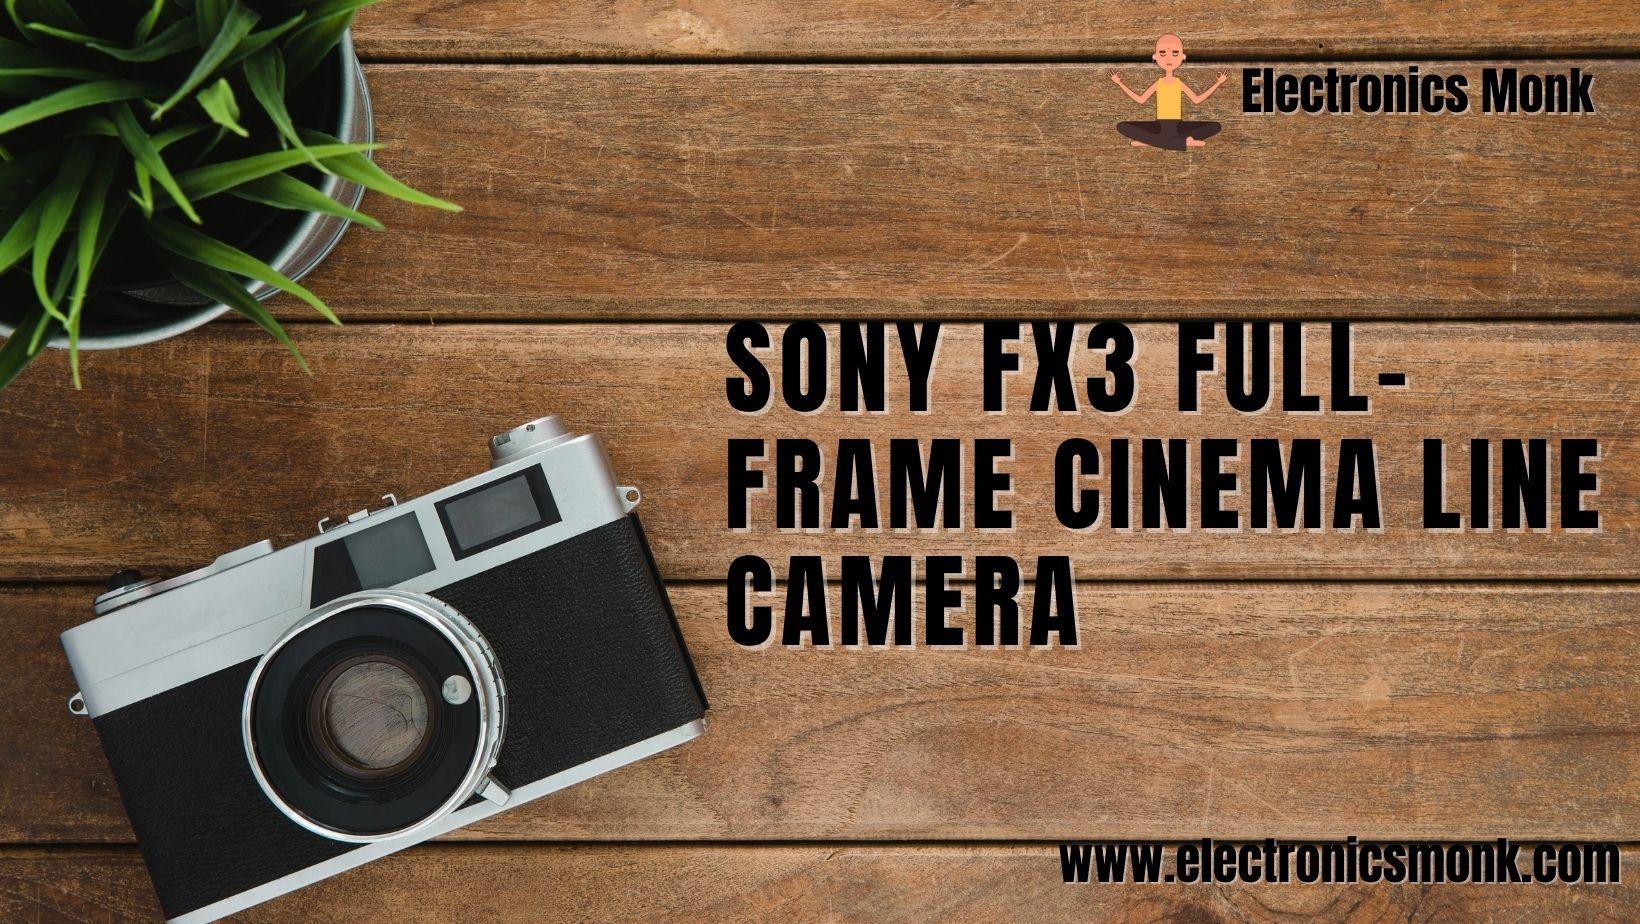 Sony FX3 Full-Frame Cinema line Camera